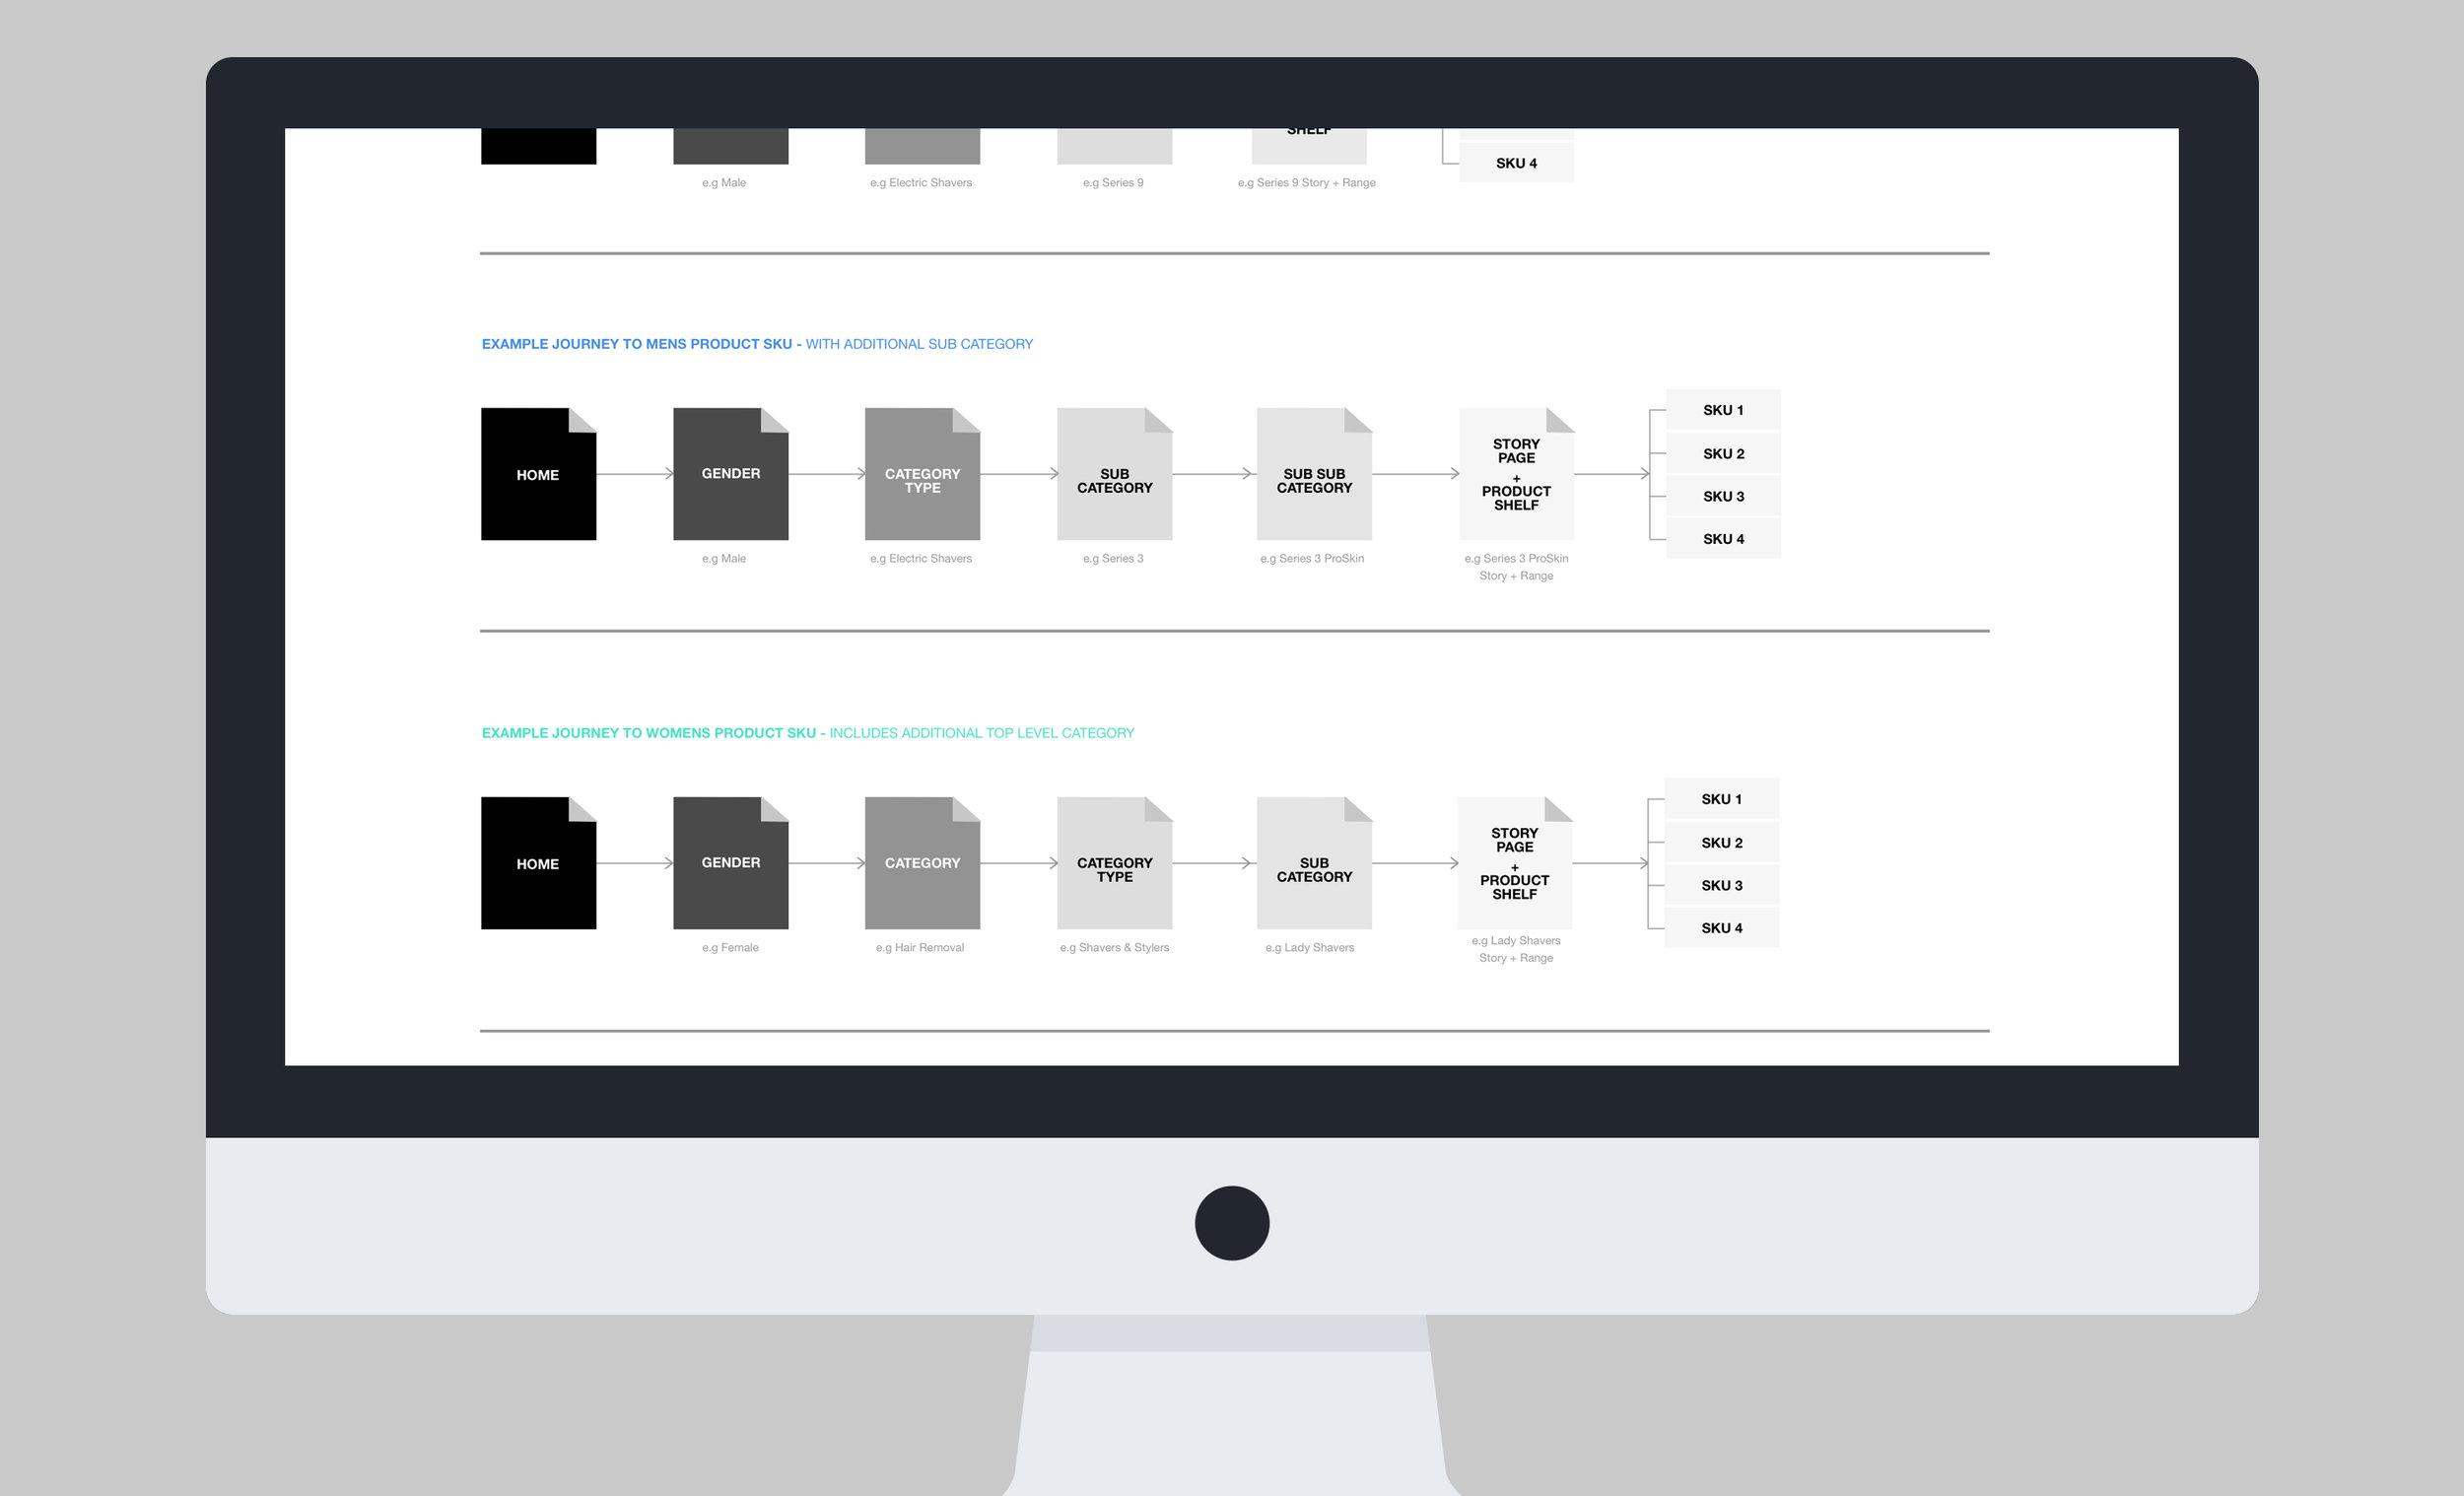 2-iMac-Mockup-Flat-User-Flow.jpg